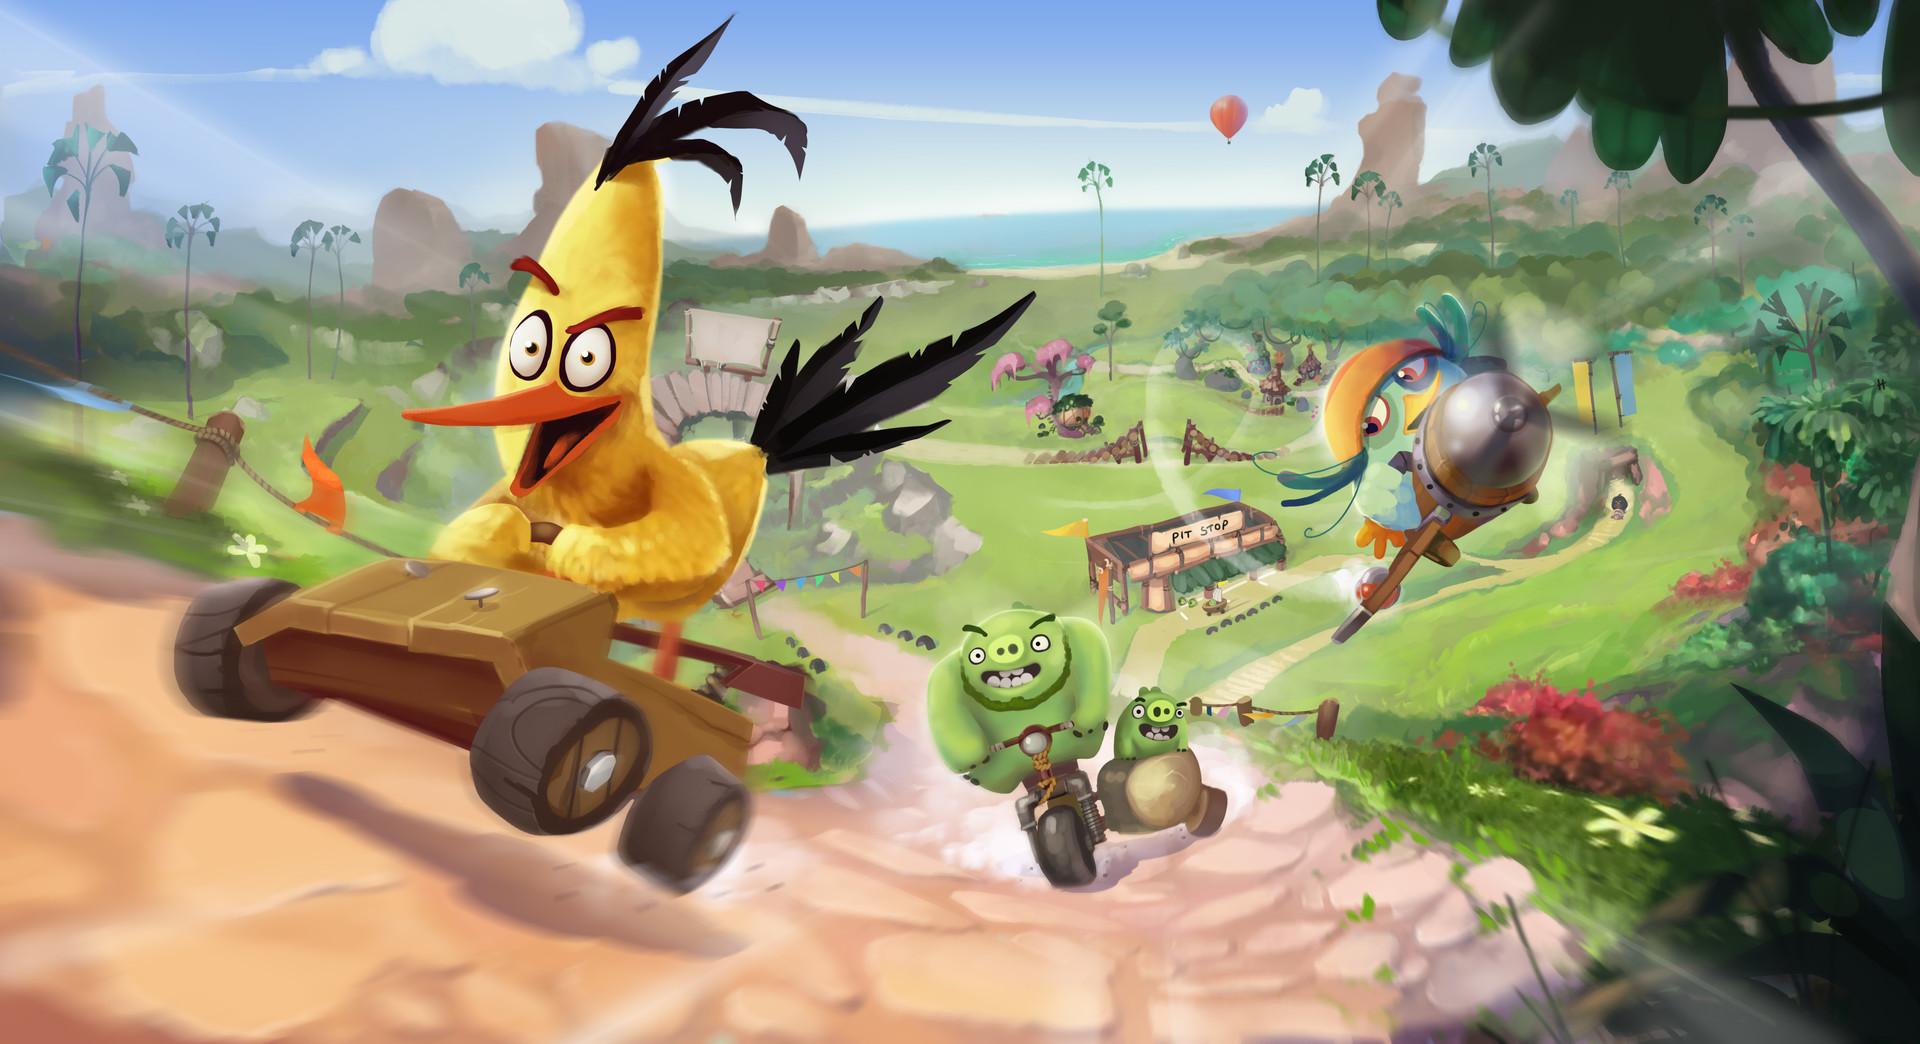 ArtStation - Angry Birds Go 2, Shakeel Alli